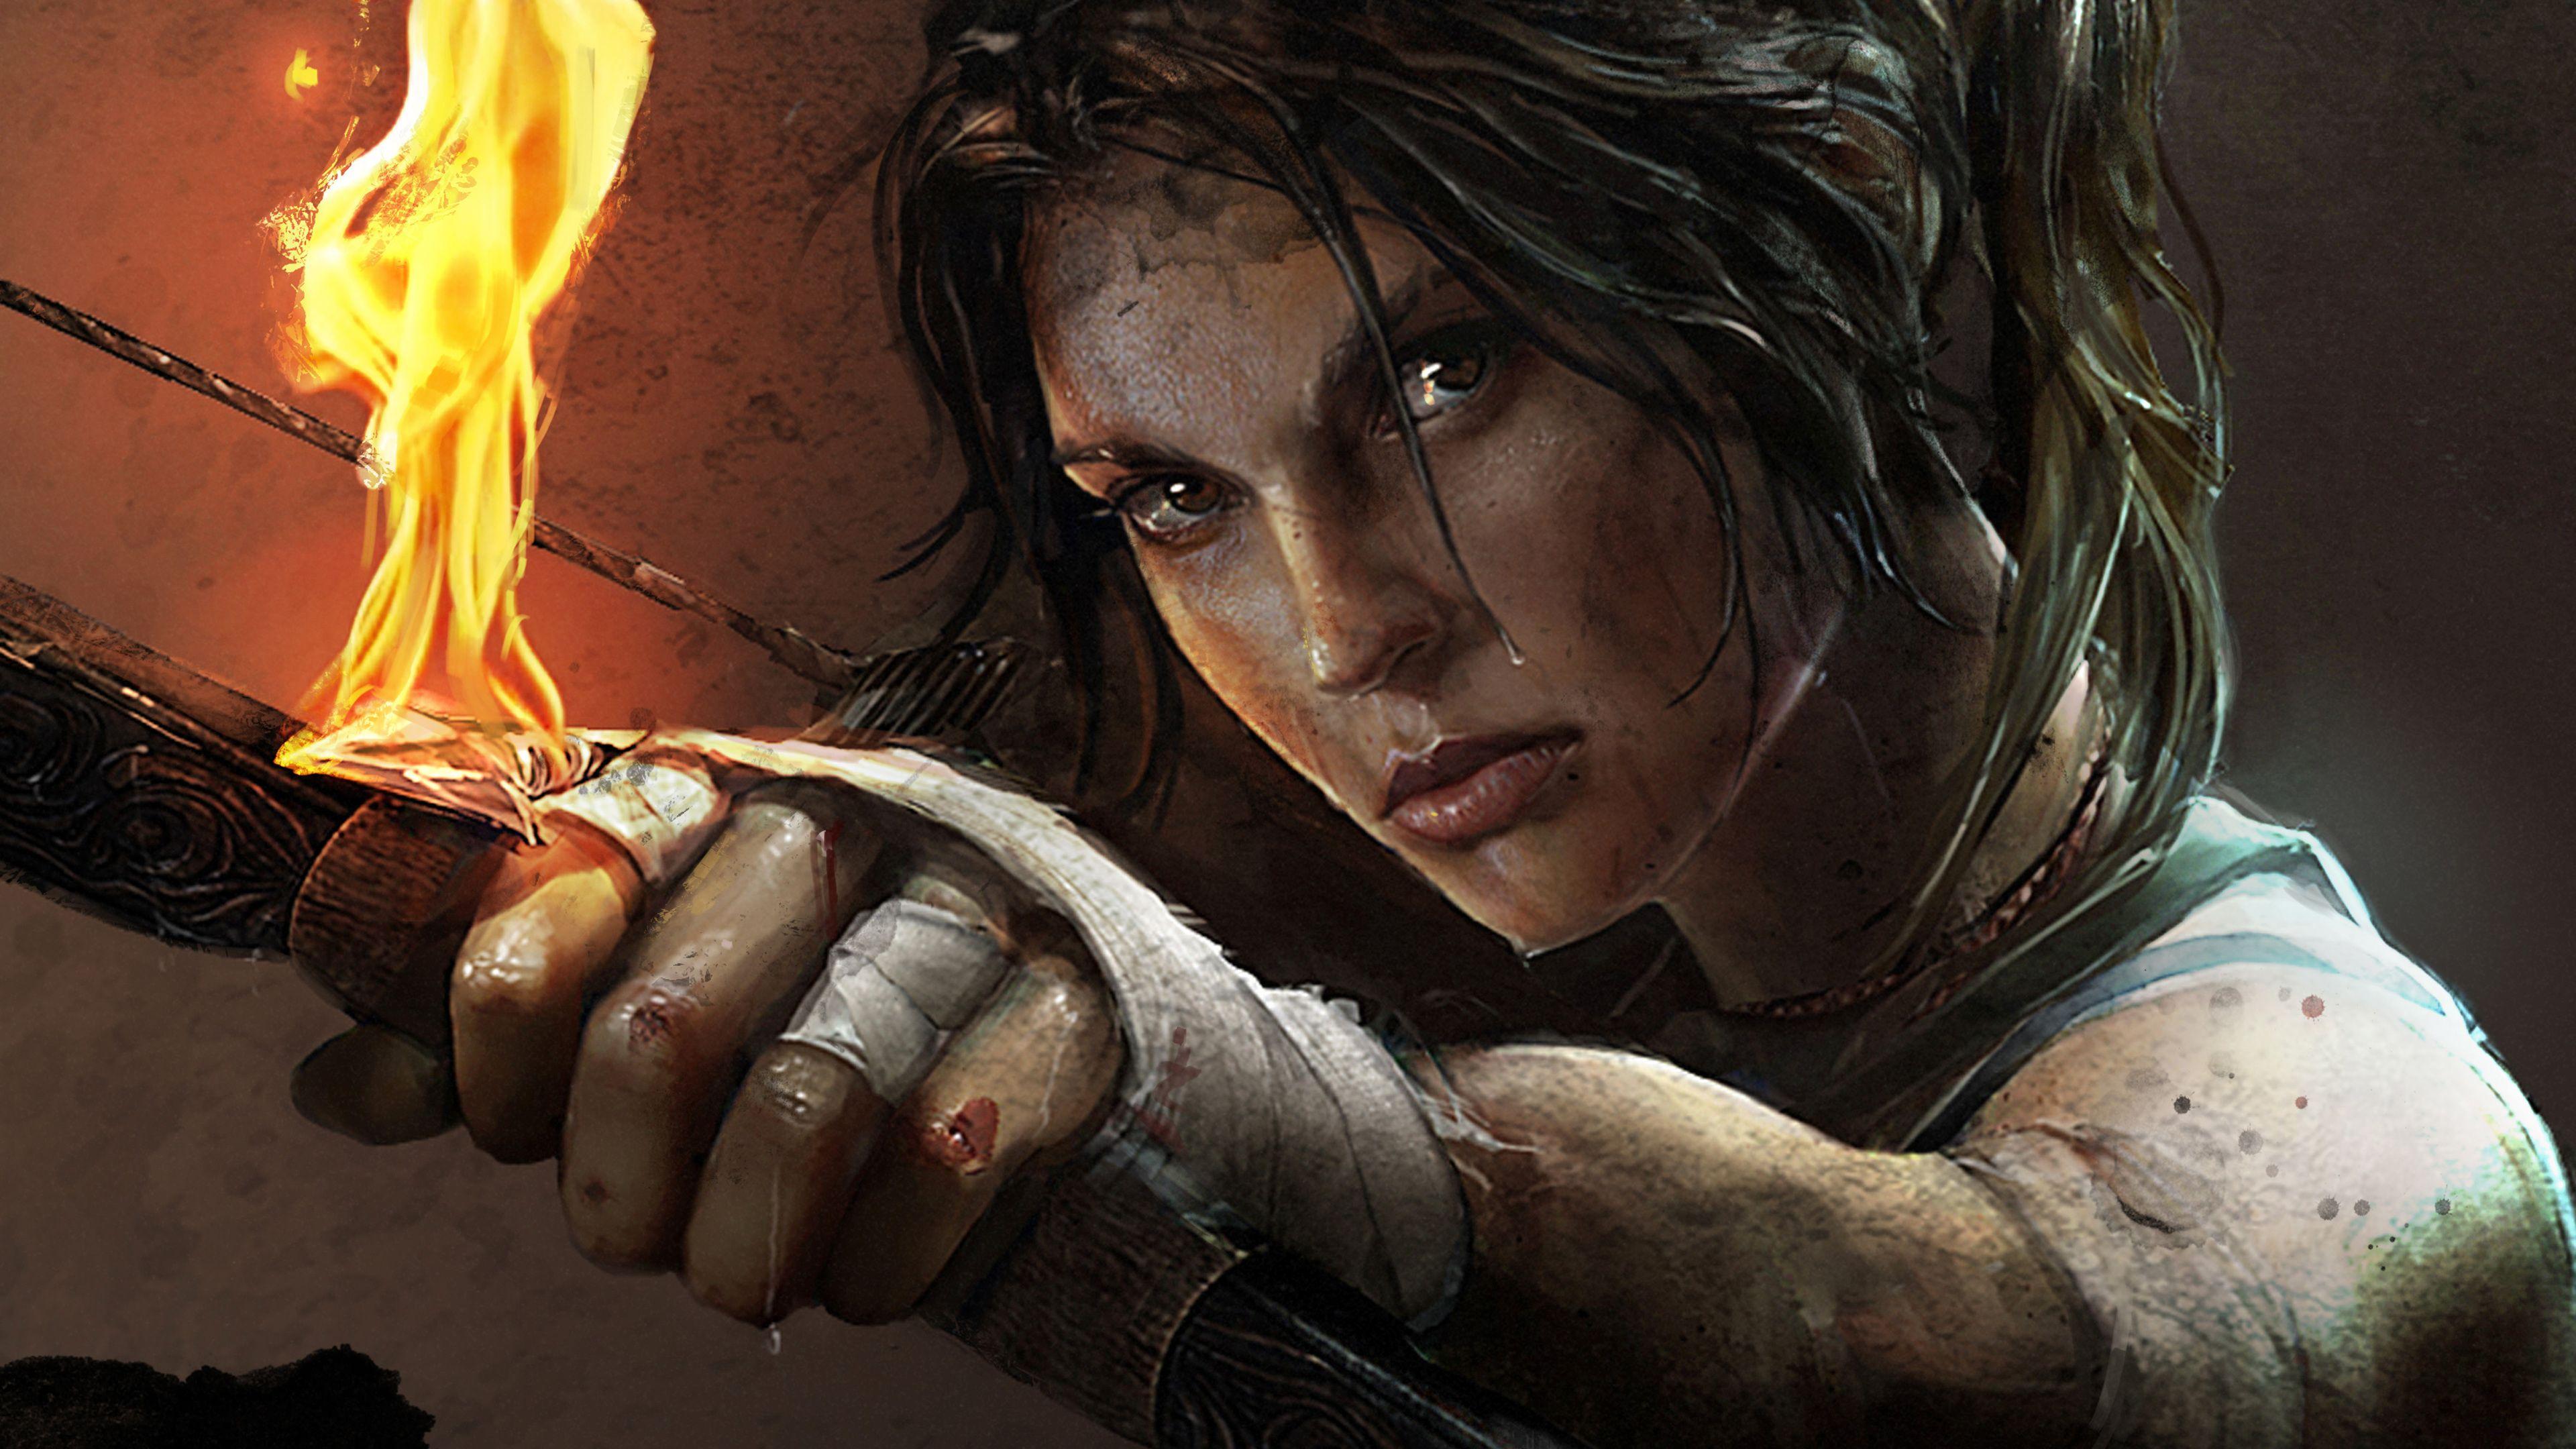 Tomb Raider Lara Croft Artwork 4k Xbox Games Wallpapers Tomb Raider Wallpapers Ps Games Wallpa Tomb Raider Artwork Tomb Raider Wallpaper Lara Croft Wallpaper